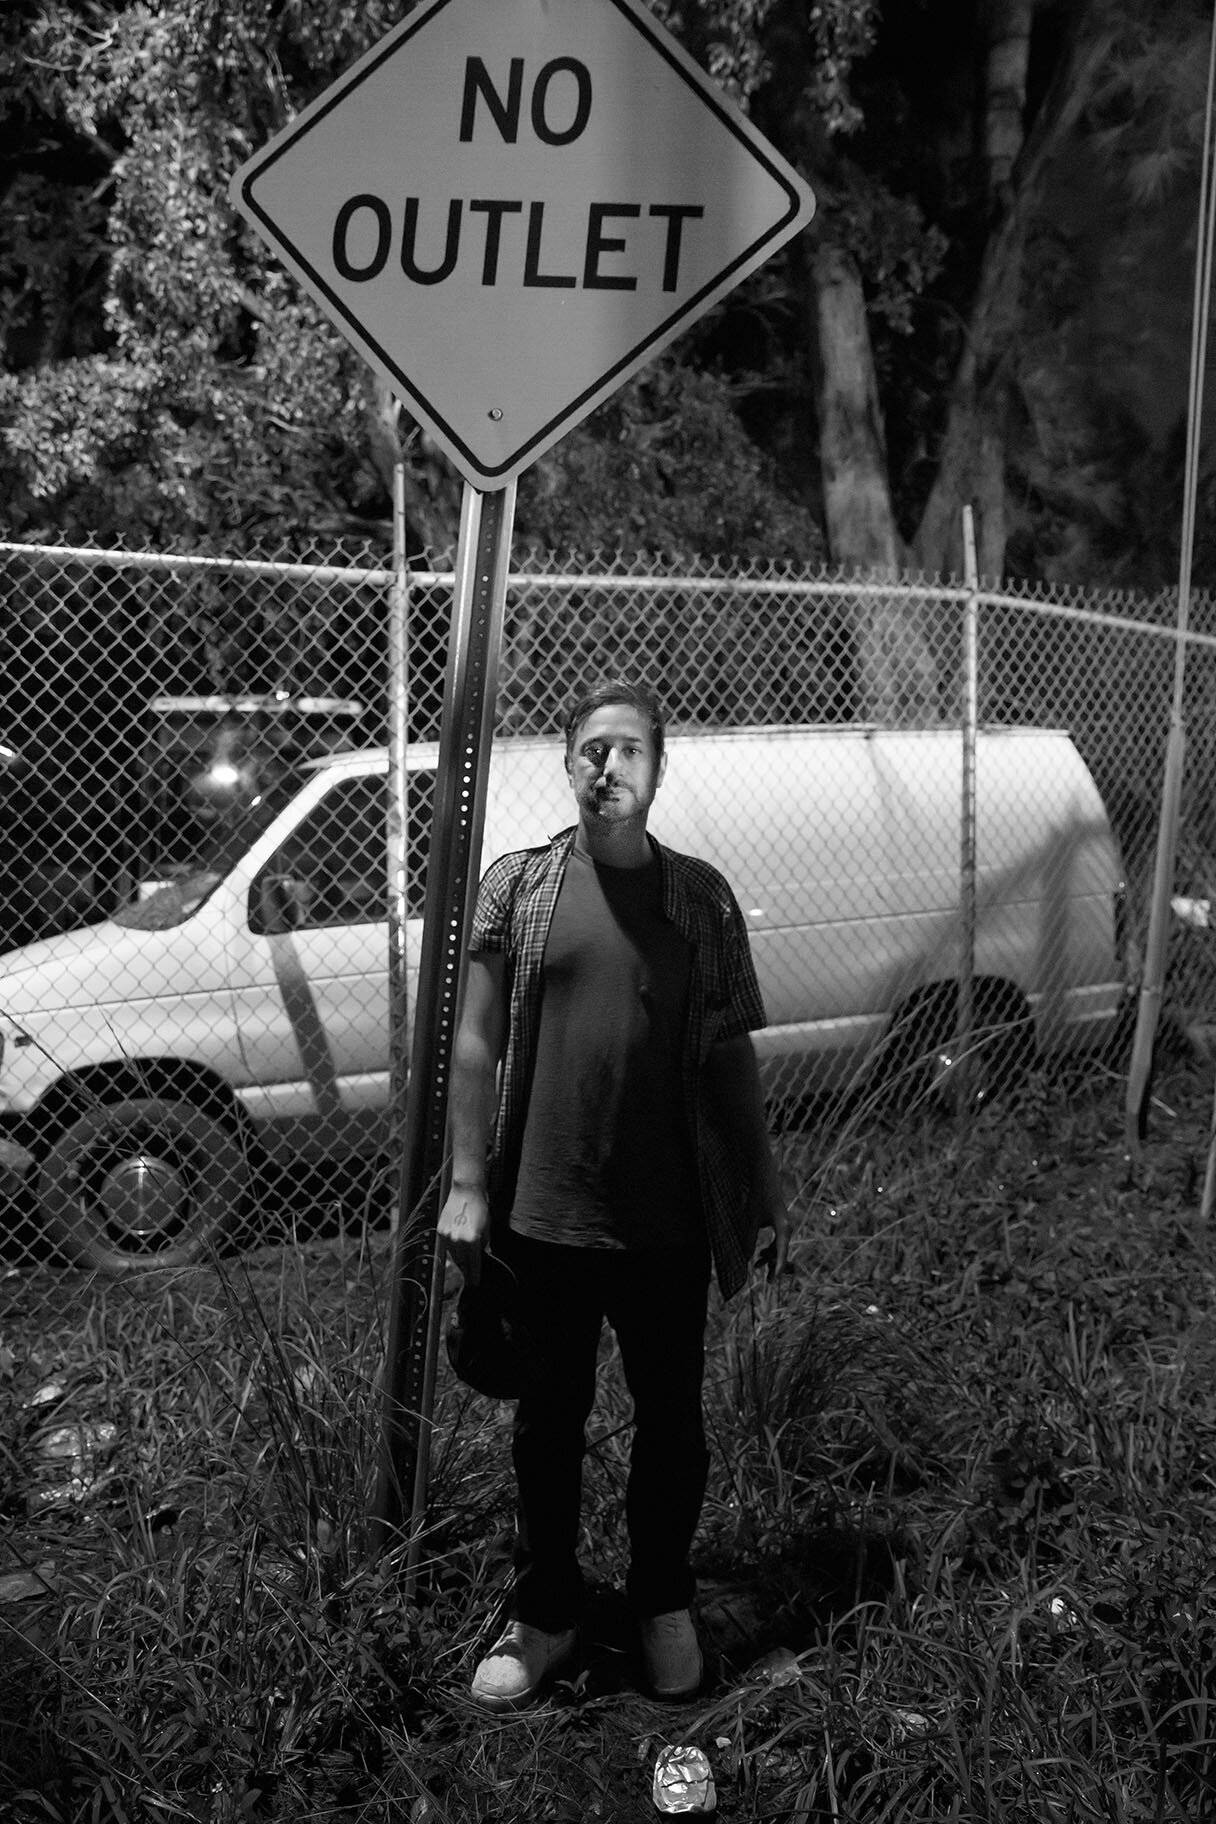 harmony-korine-artist-new-york-film-director-guillaume-ziccarelli-01.jpg